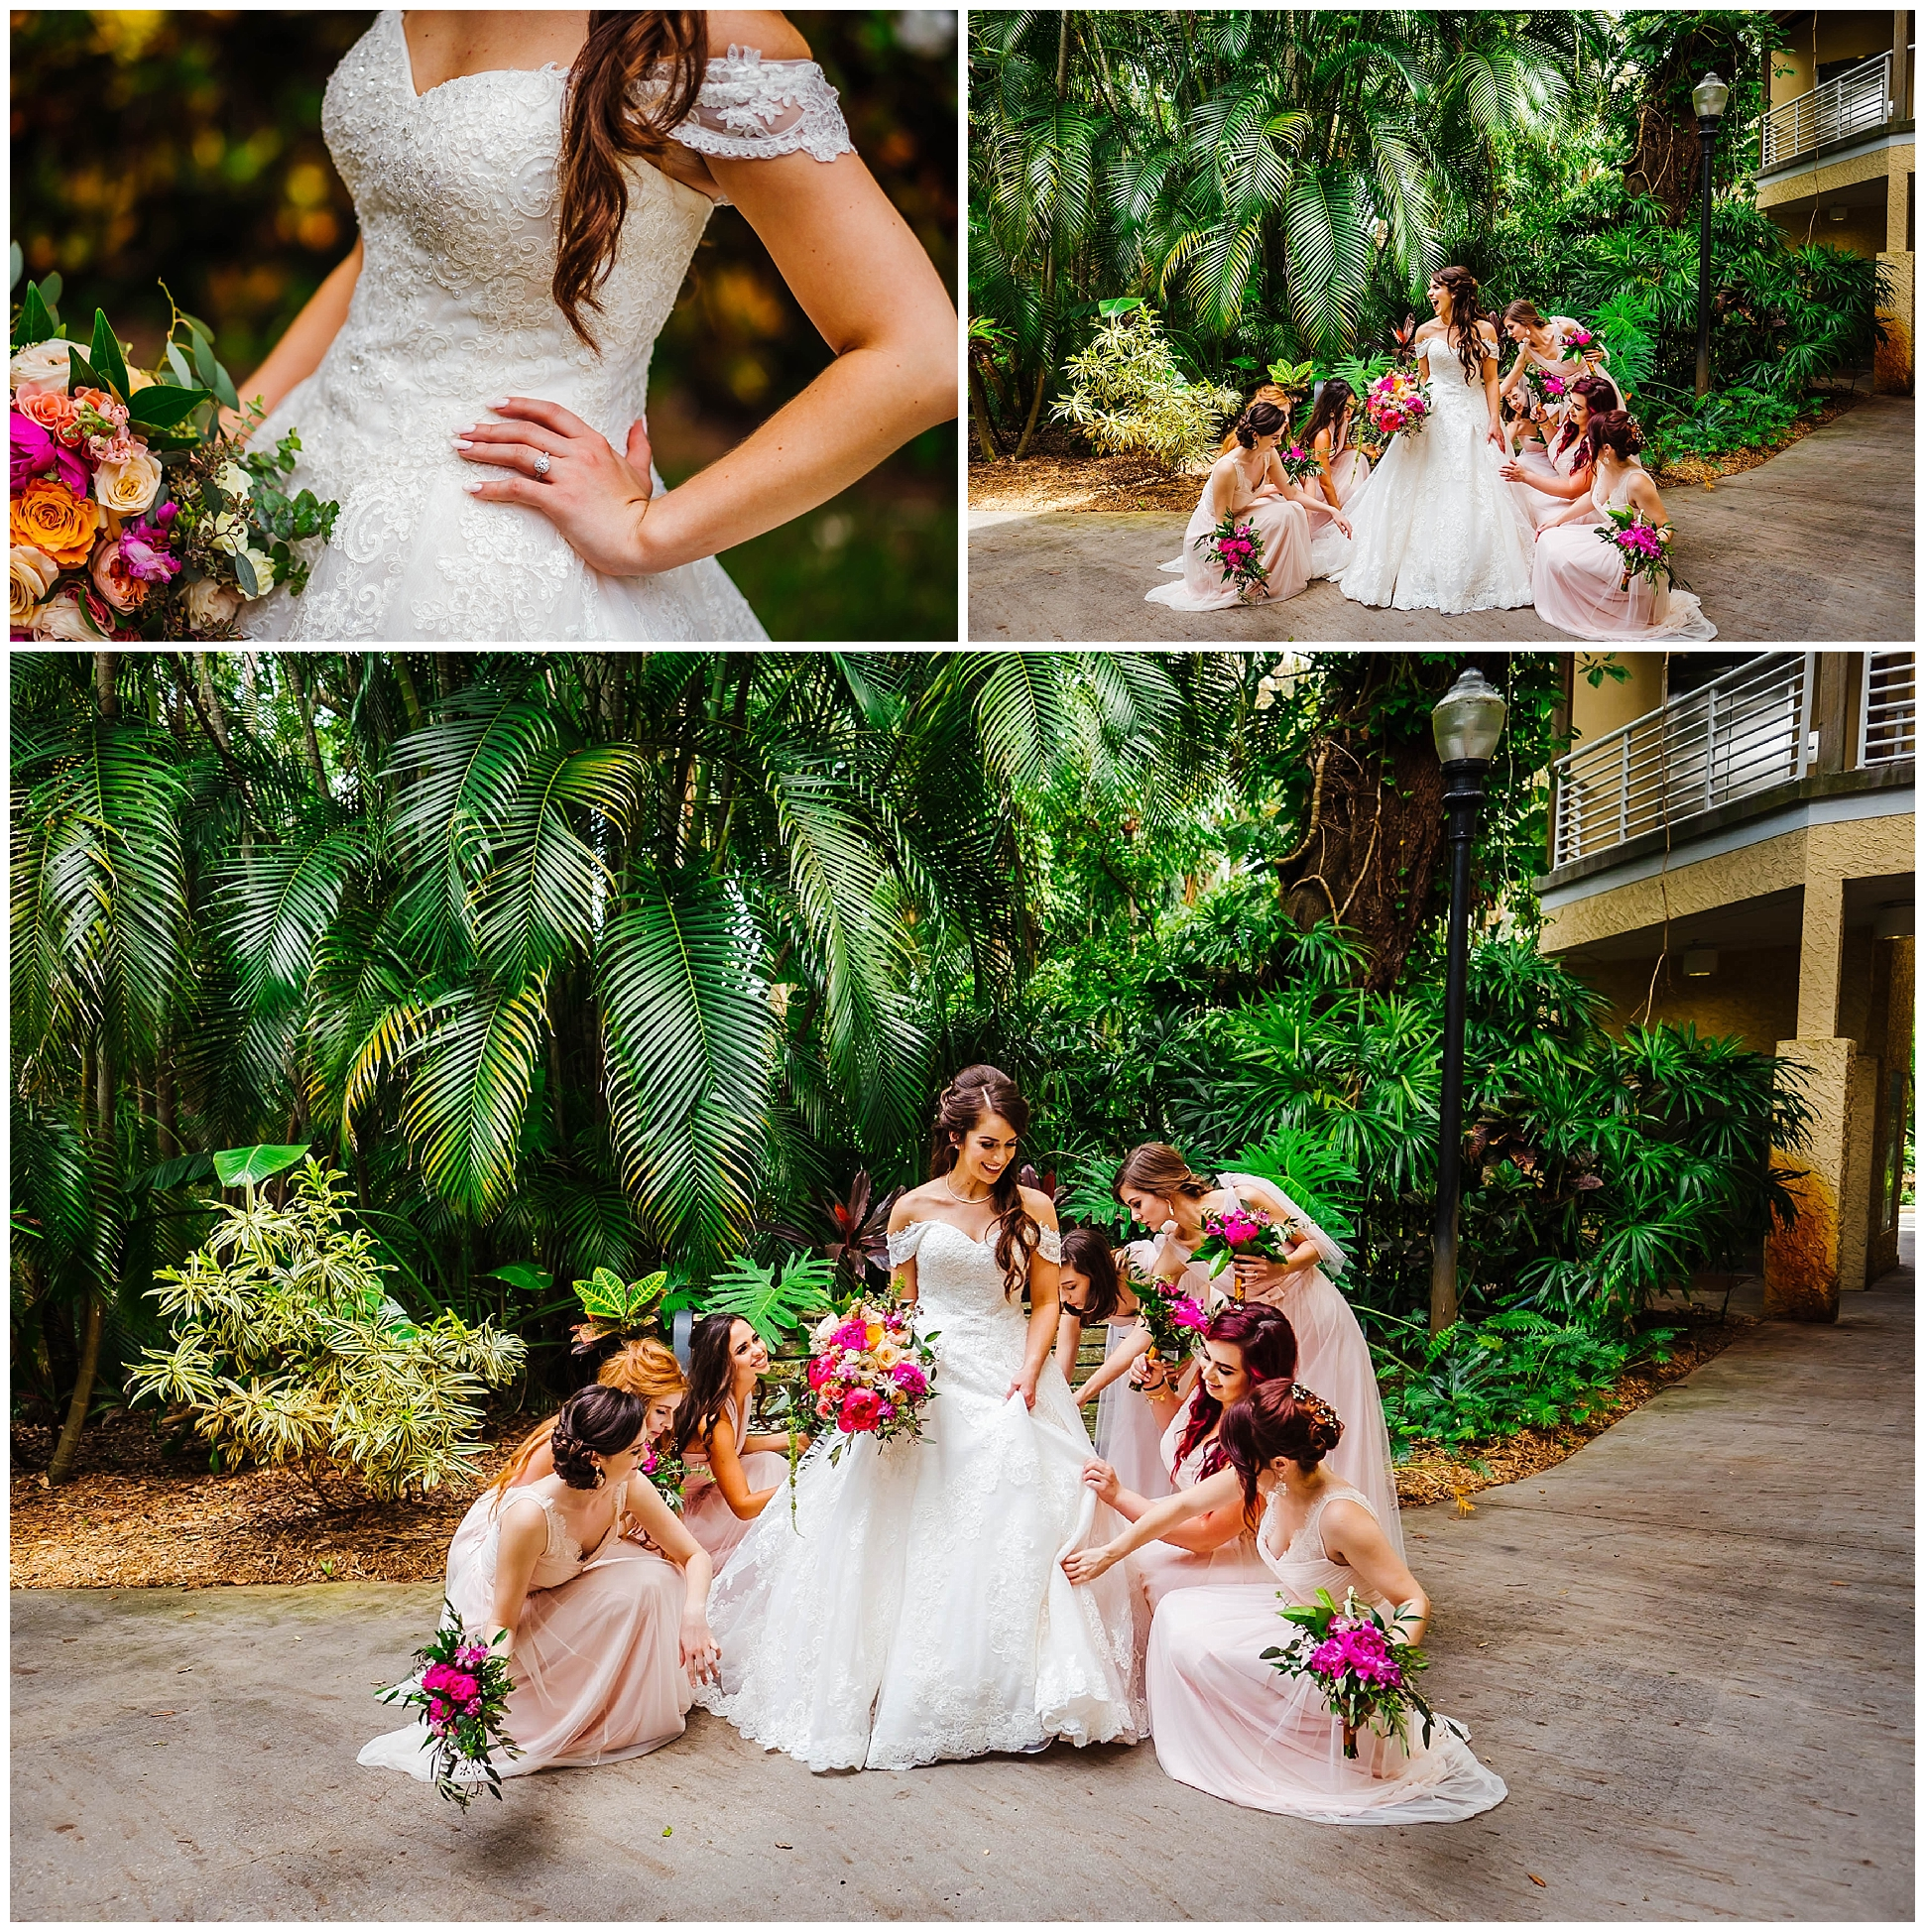 st-pete-wedding-photographer-sunken-gardens-crystal-ballroom-princess-dancer_0133.jpg